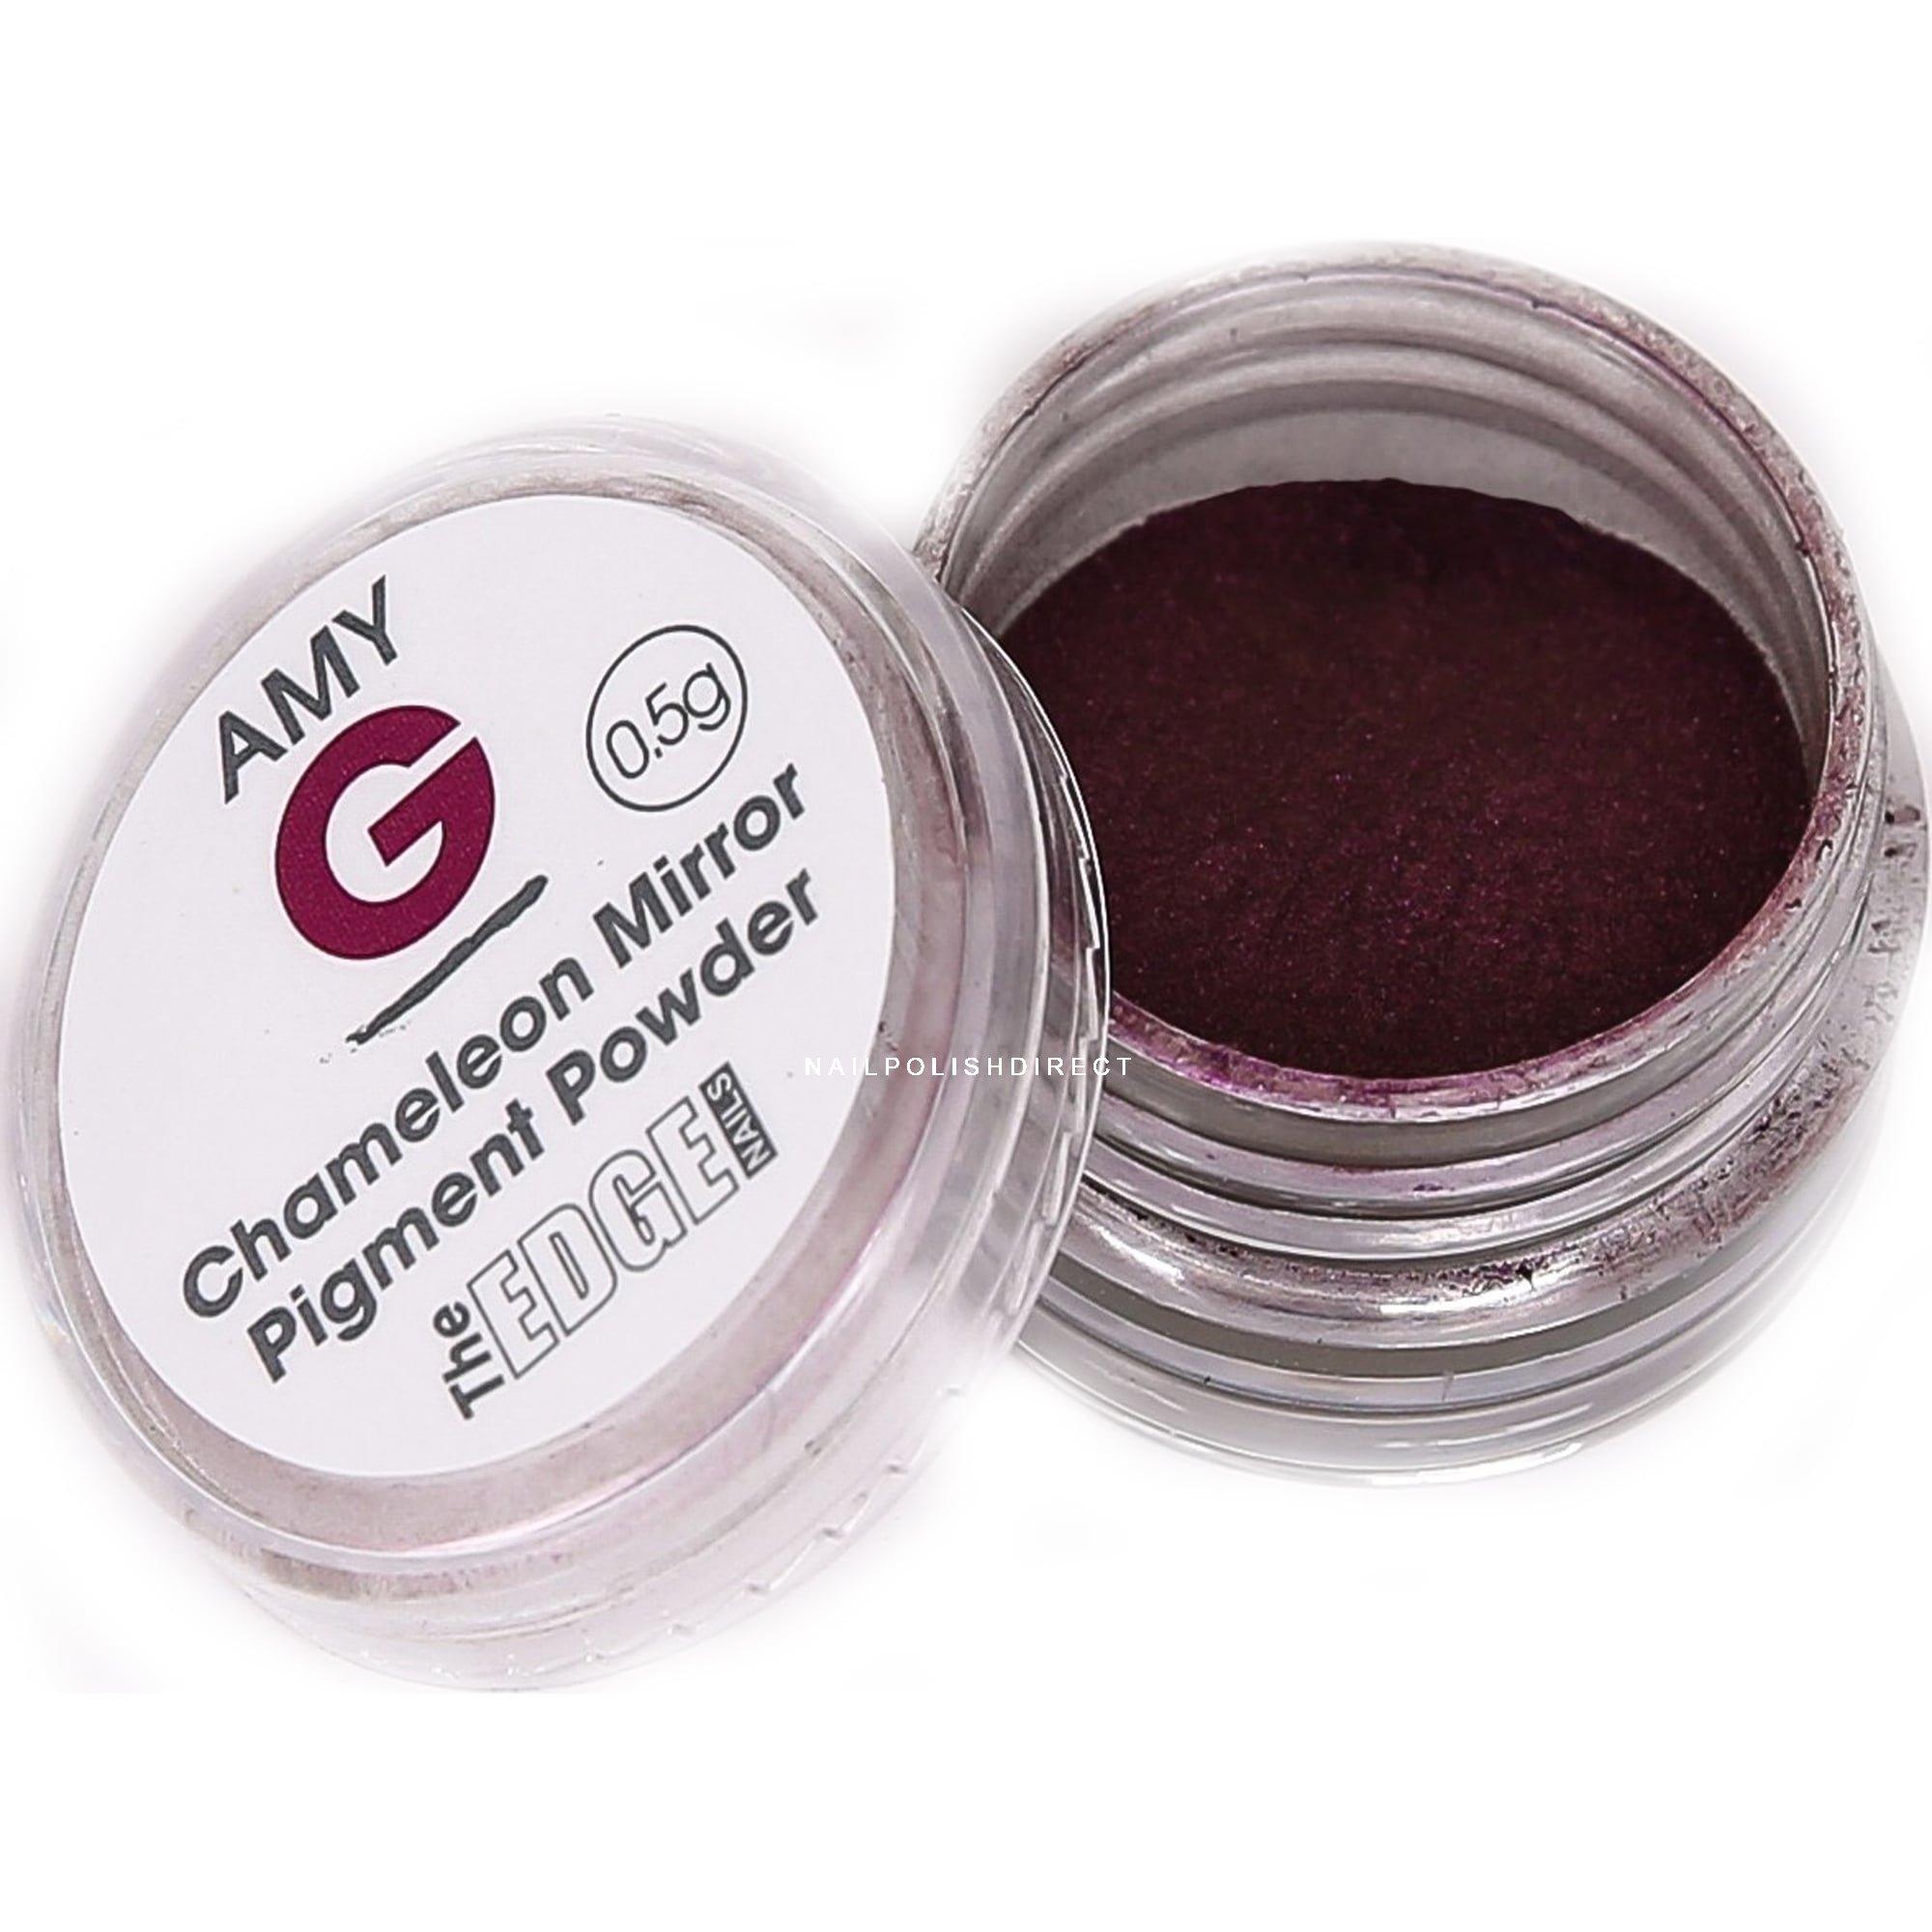 Amy G - Mirror Pigment Nail Art Powders - Chameleon 0.5g (3003015)